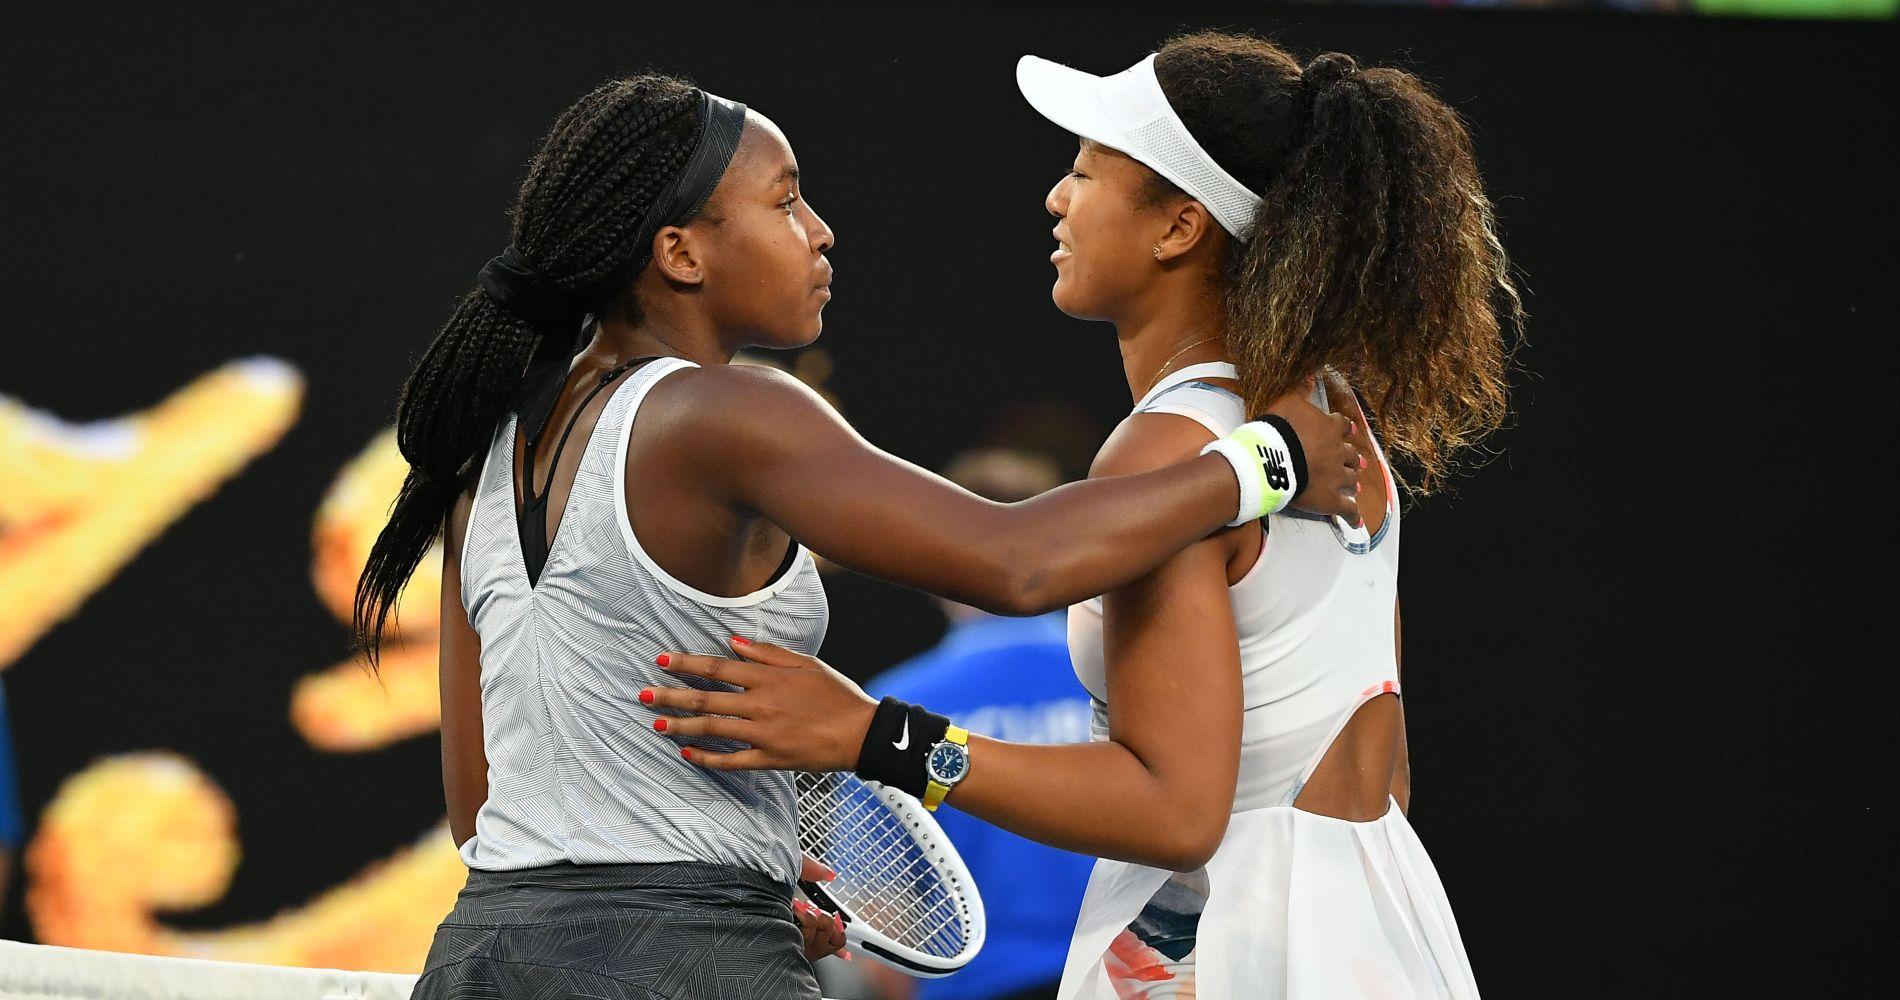 Coco Gauff and Naomi Osaka, Australian Open 2020